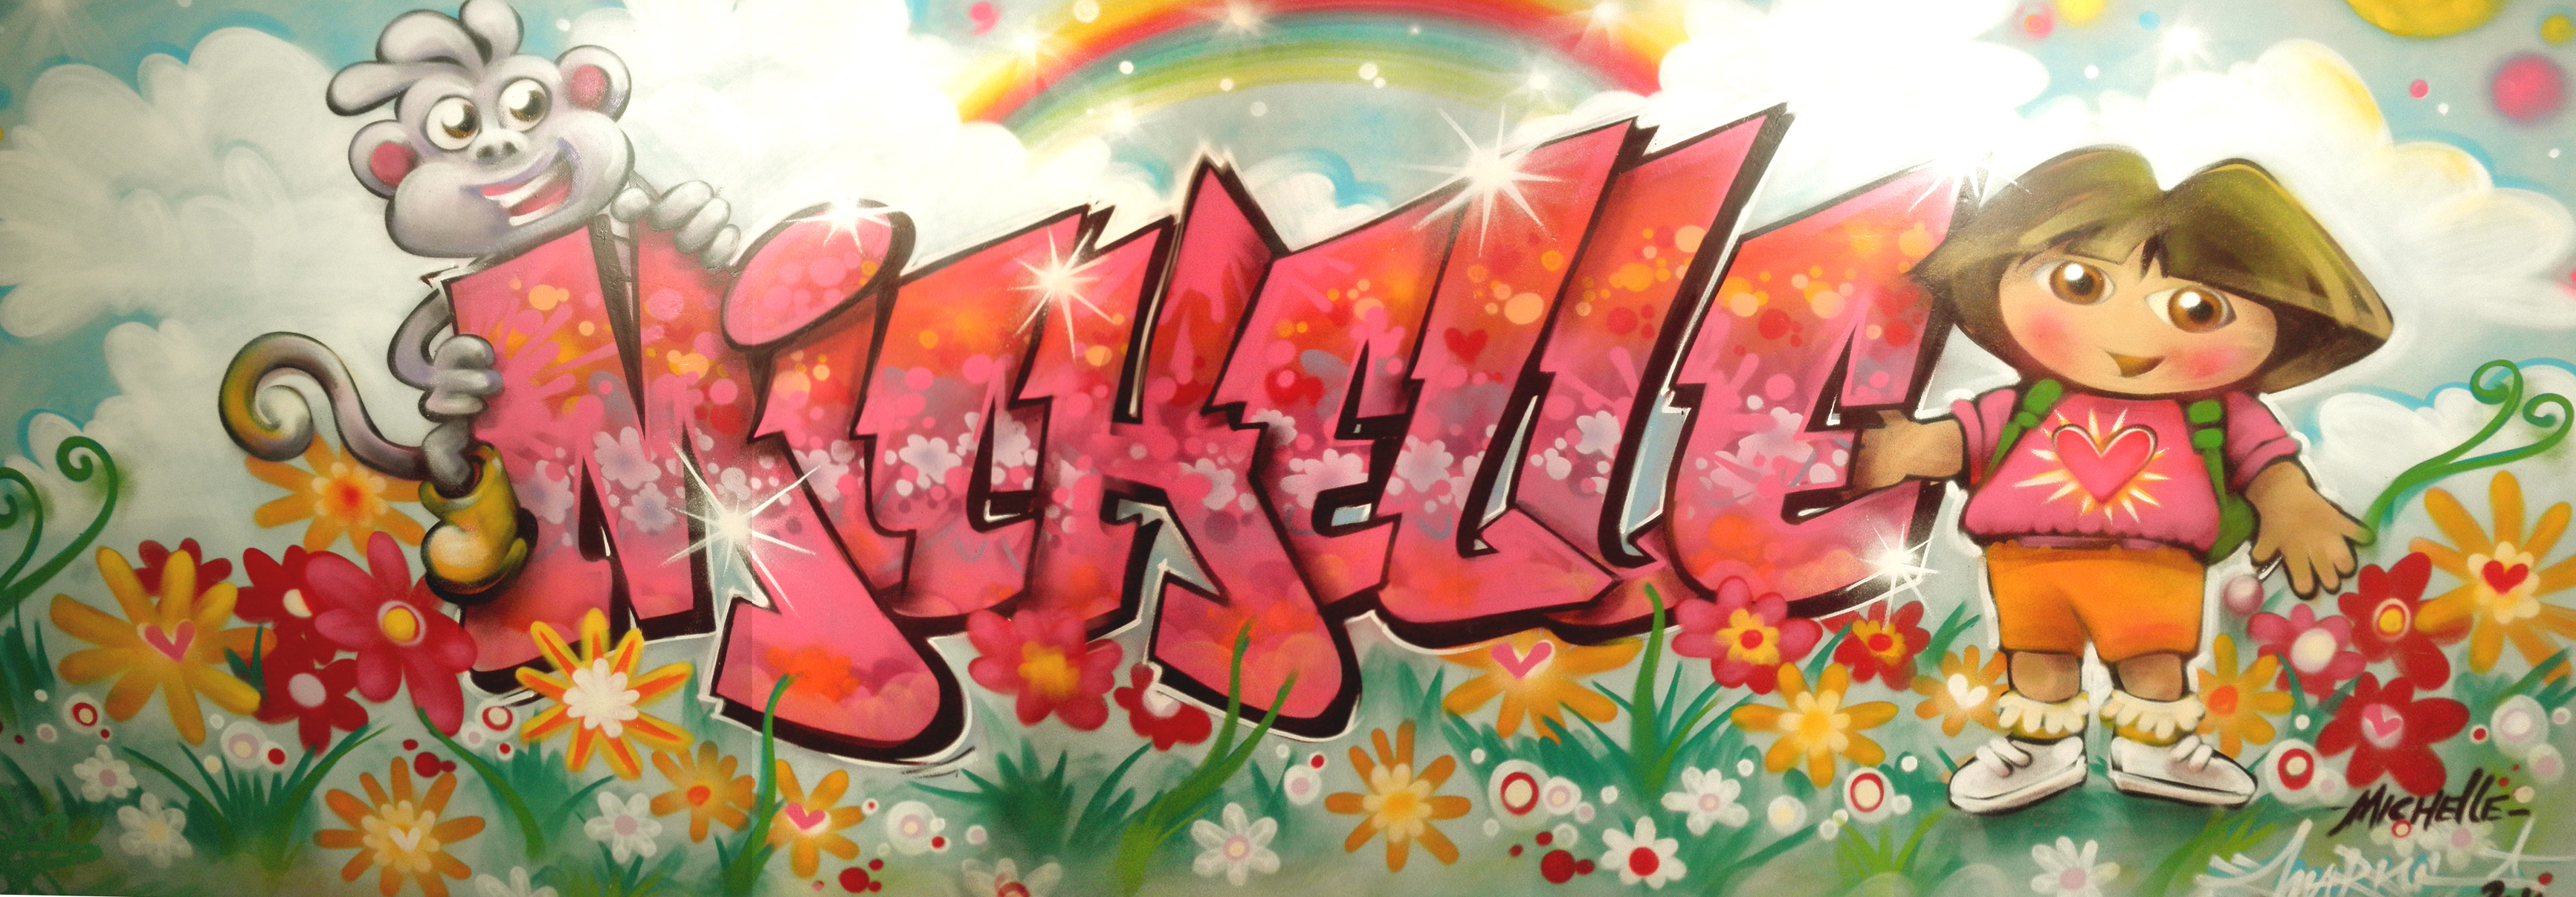 Baby peuterkleuterkamers  Muurschilderingen  Graffiti